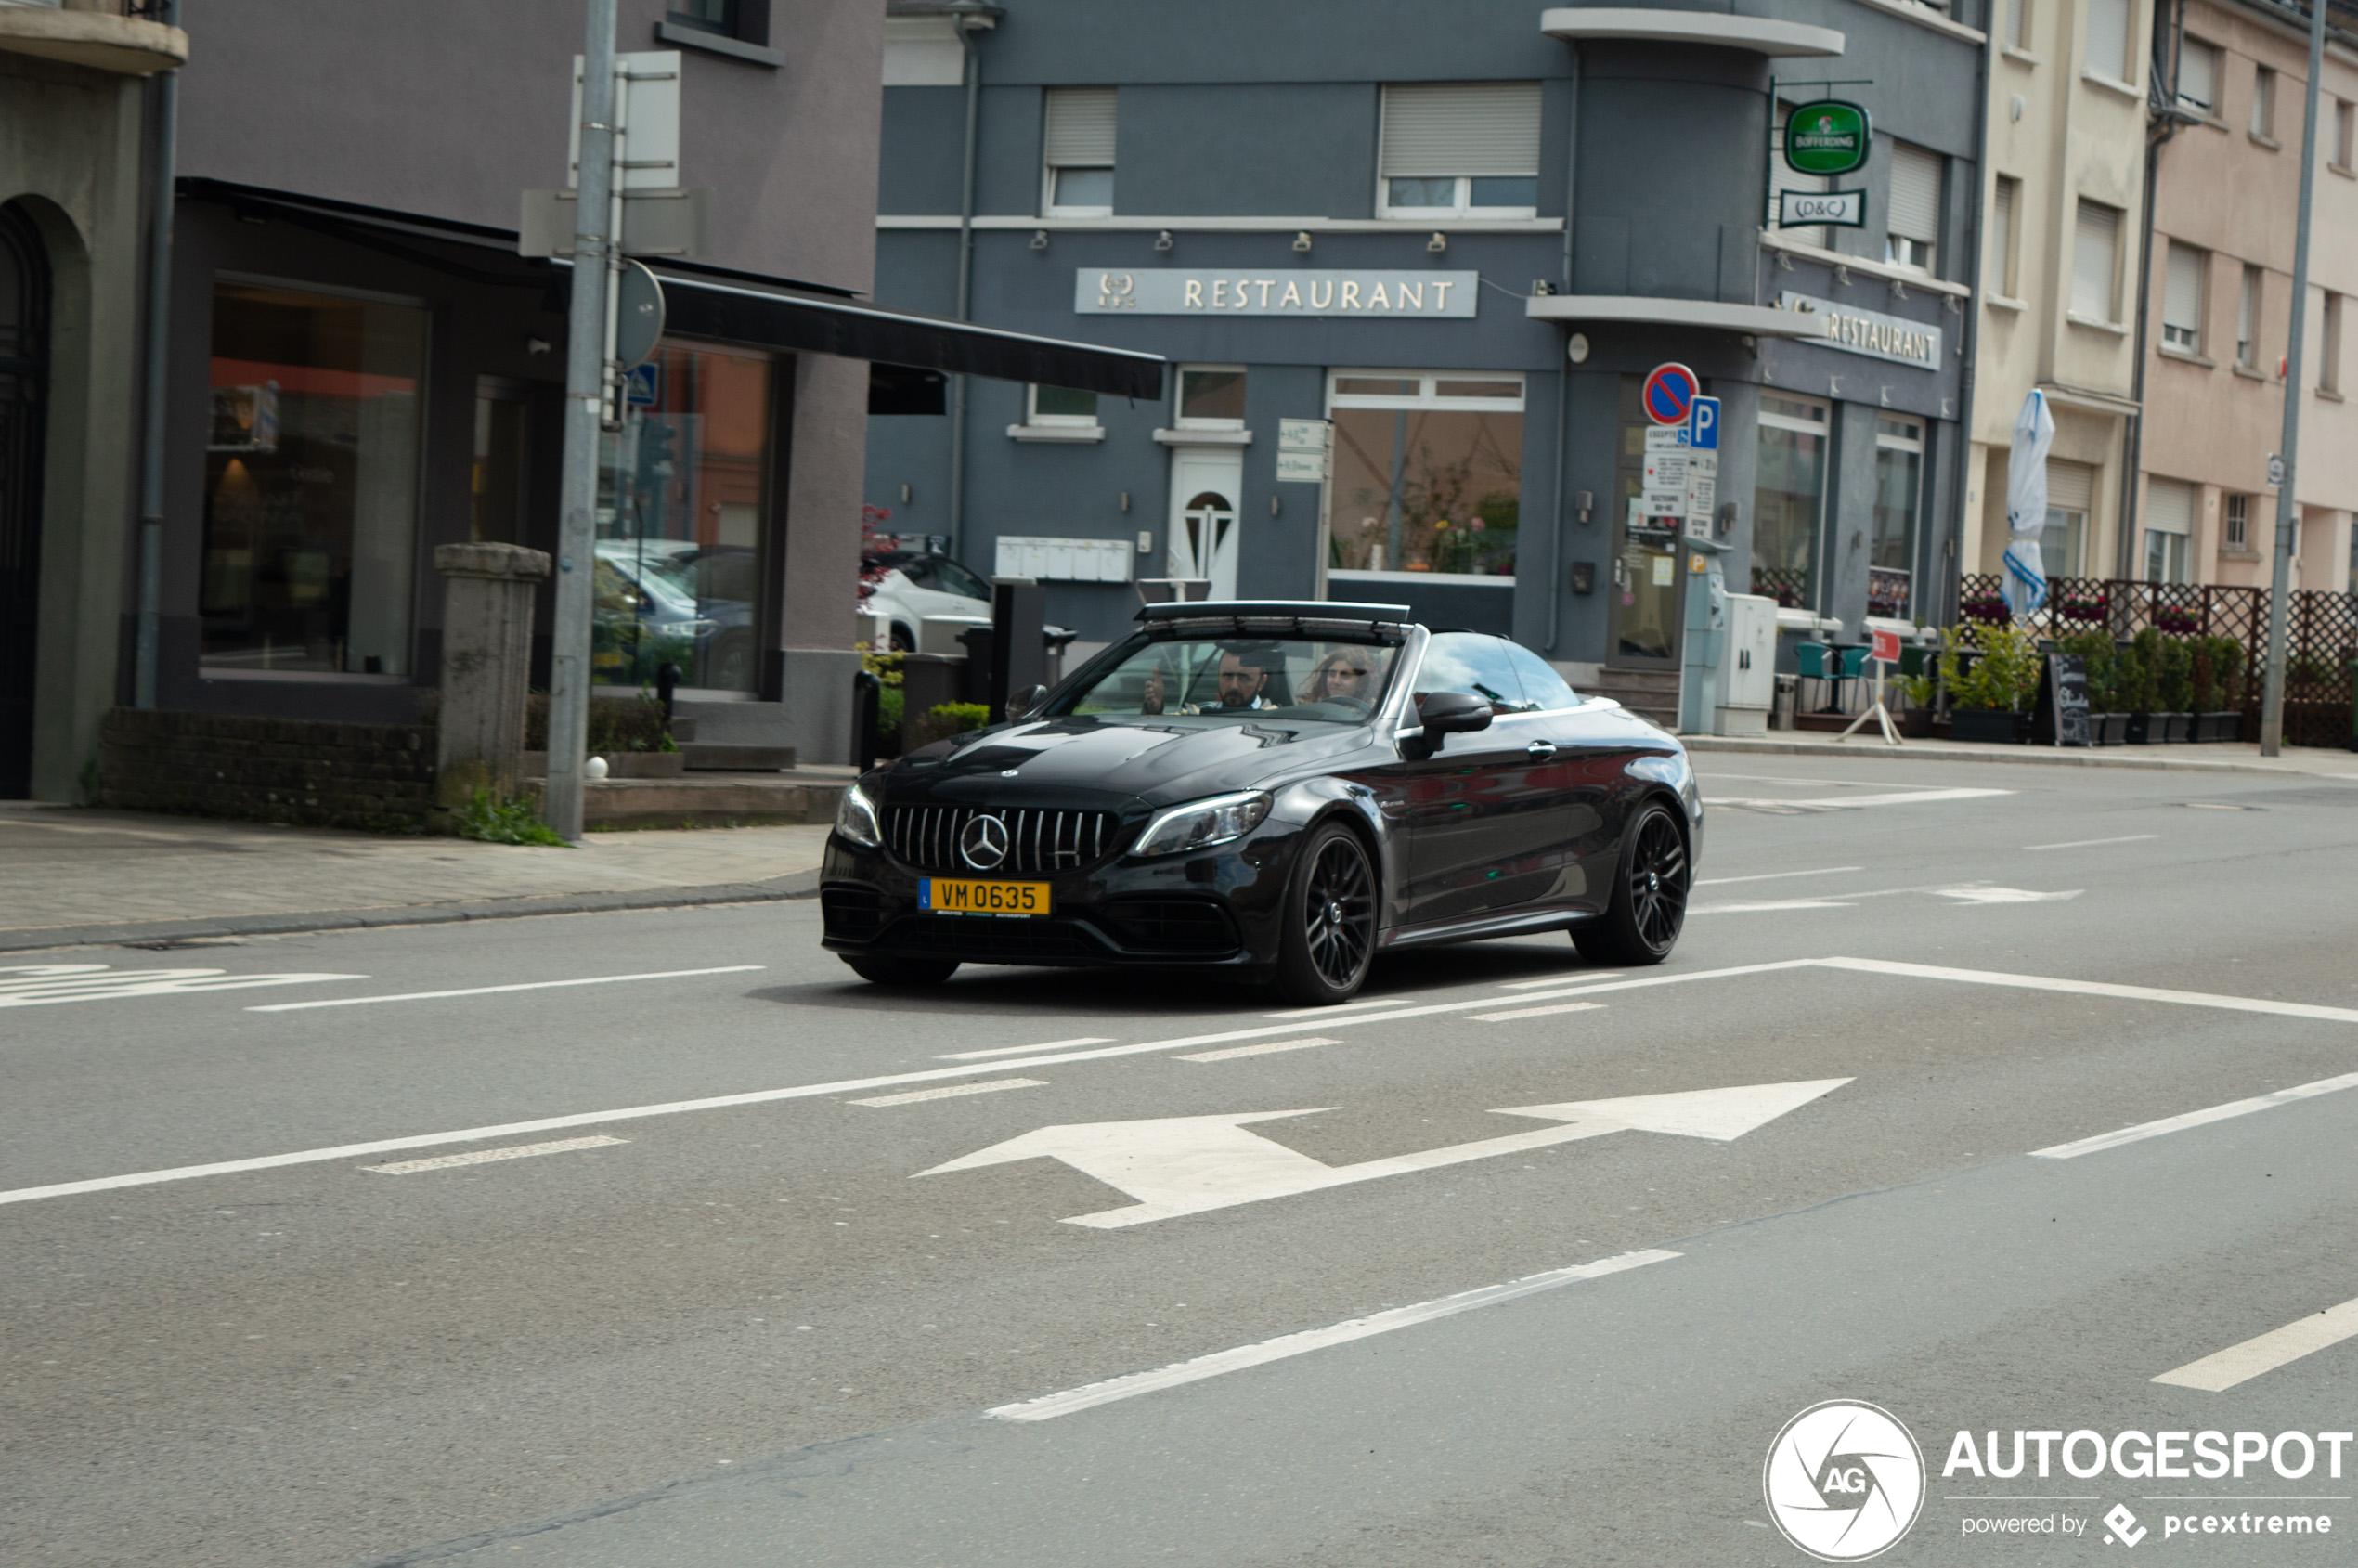 Mercedes-AMG C 63 S Convertible A205 2018